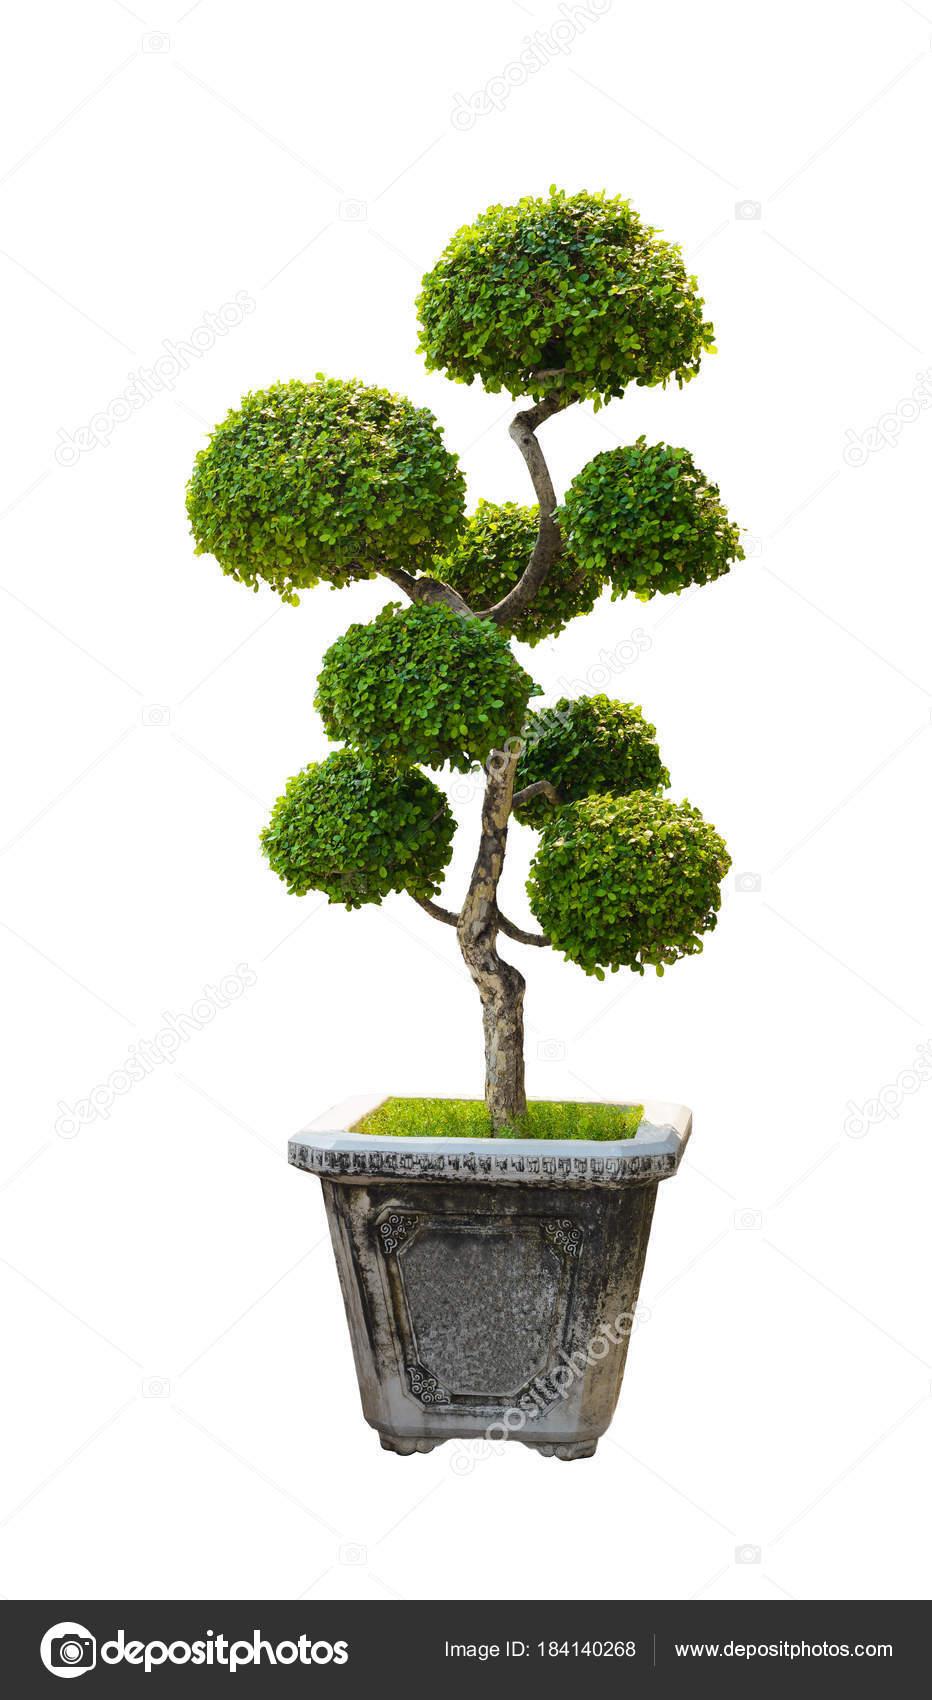 Bonsai Tree Dwarf Tree Isolated On White Background Stock Photo